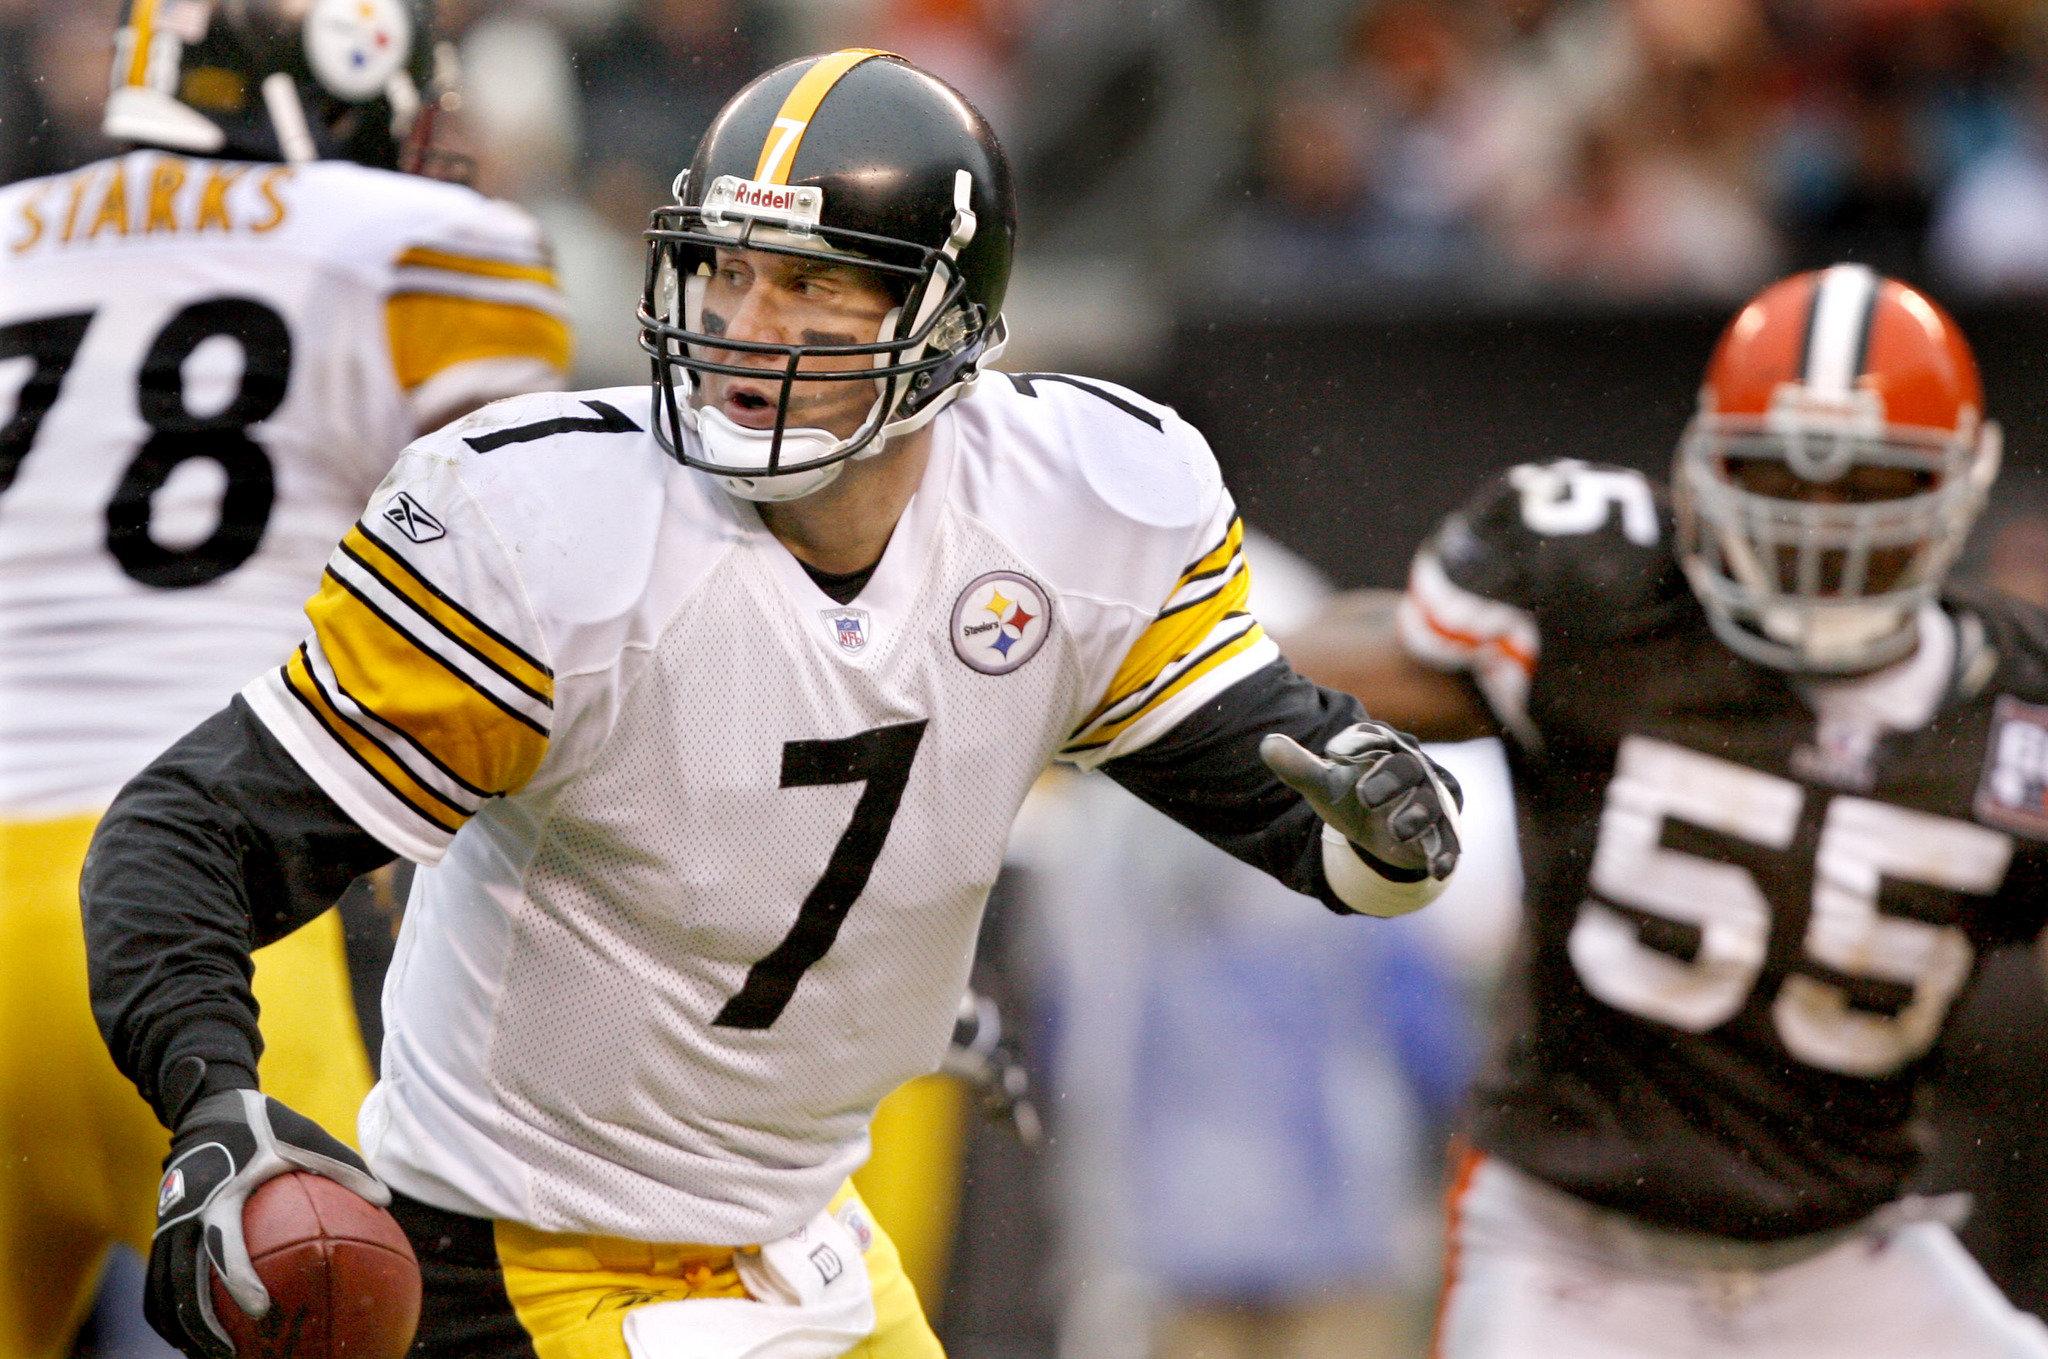 Steelers 21, Bears 9